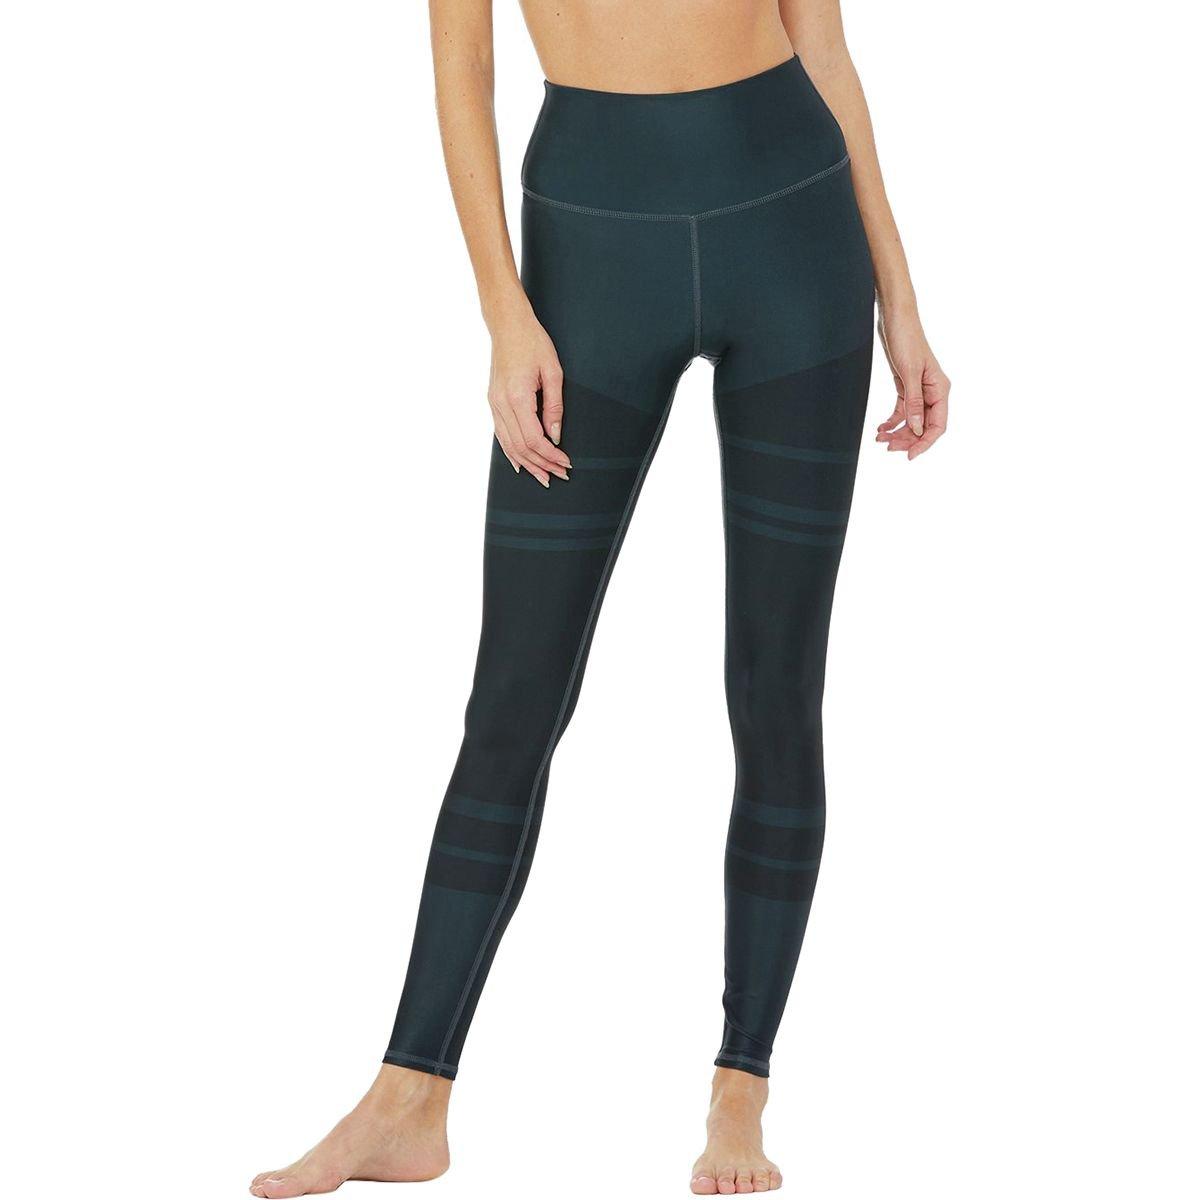 Alo Yoga High-Waist Tech Lift Airbrush Legging - Women's Black Marathon, M